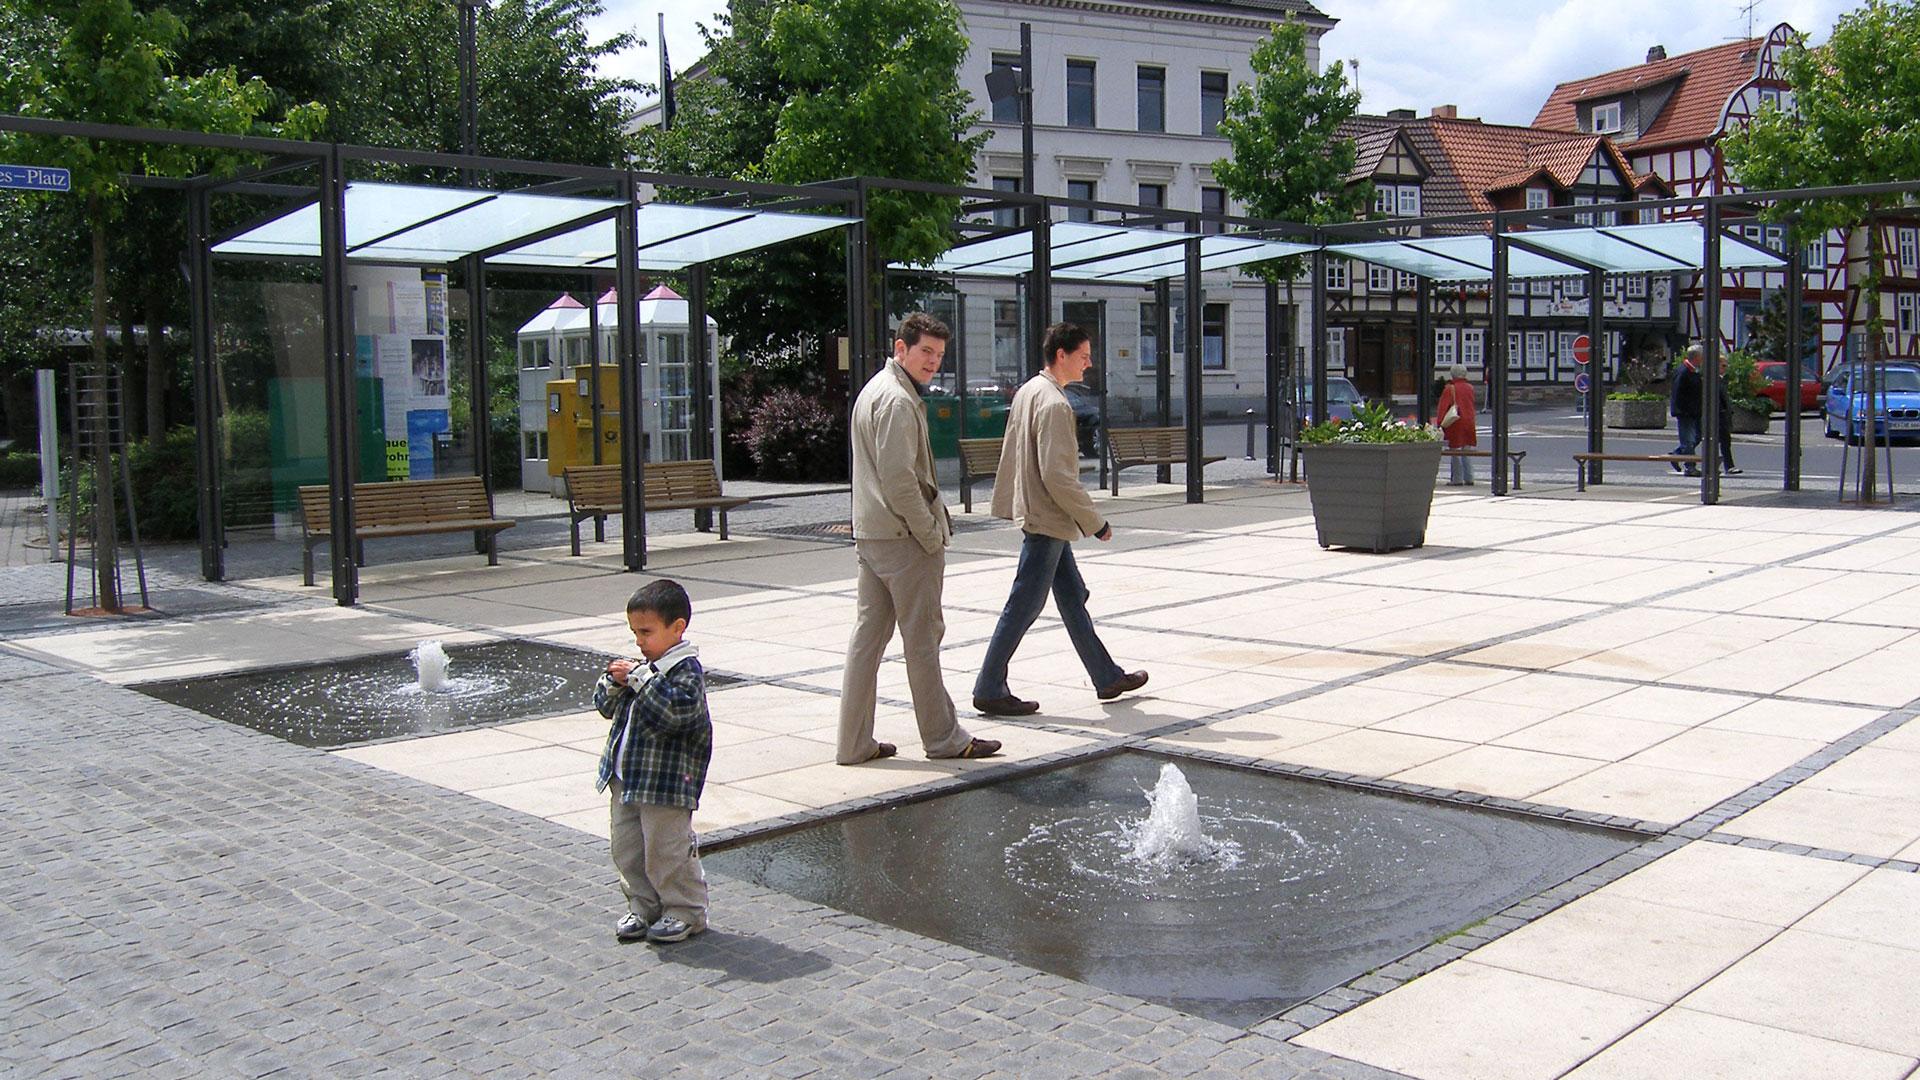 Bad_Hersfeld_Lingplatz_01